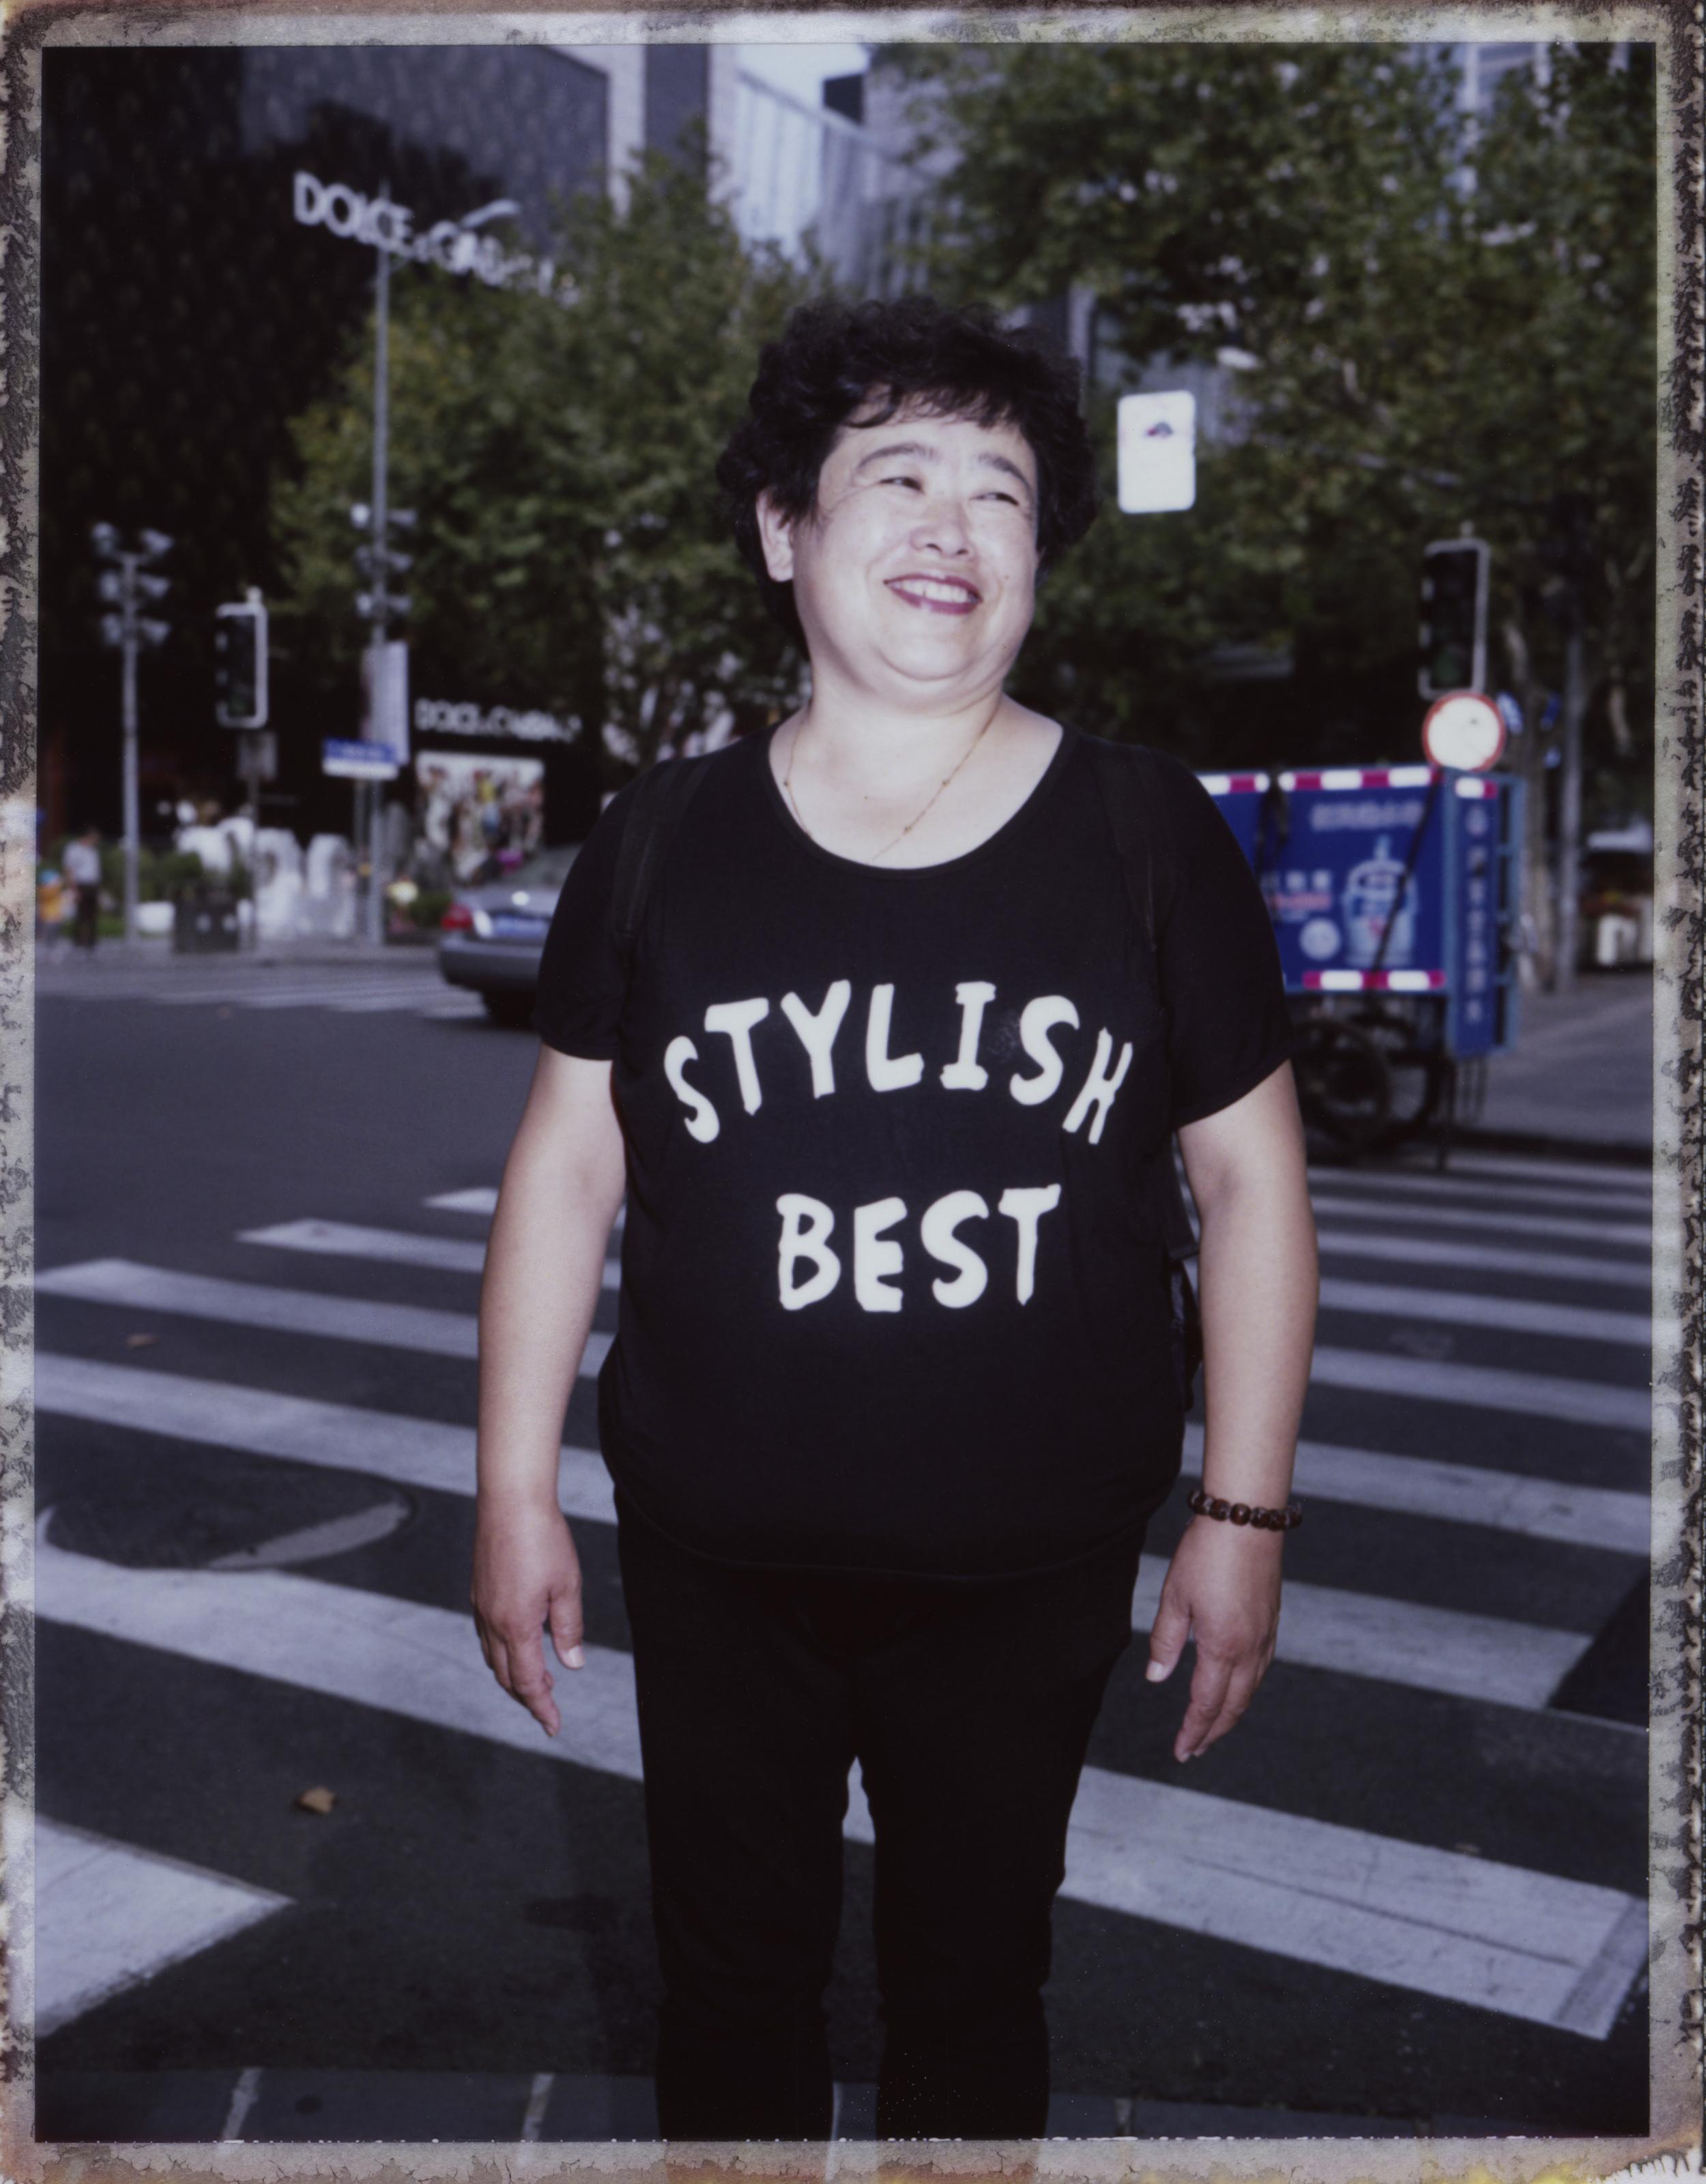 Stylish best.jpg